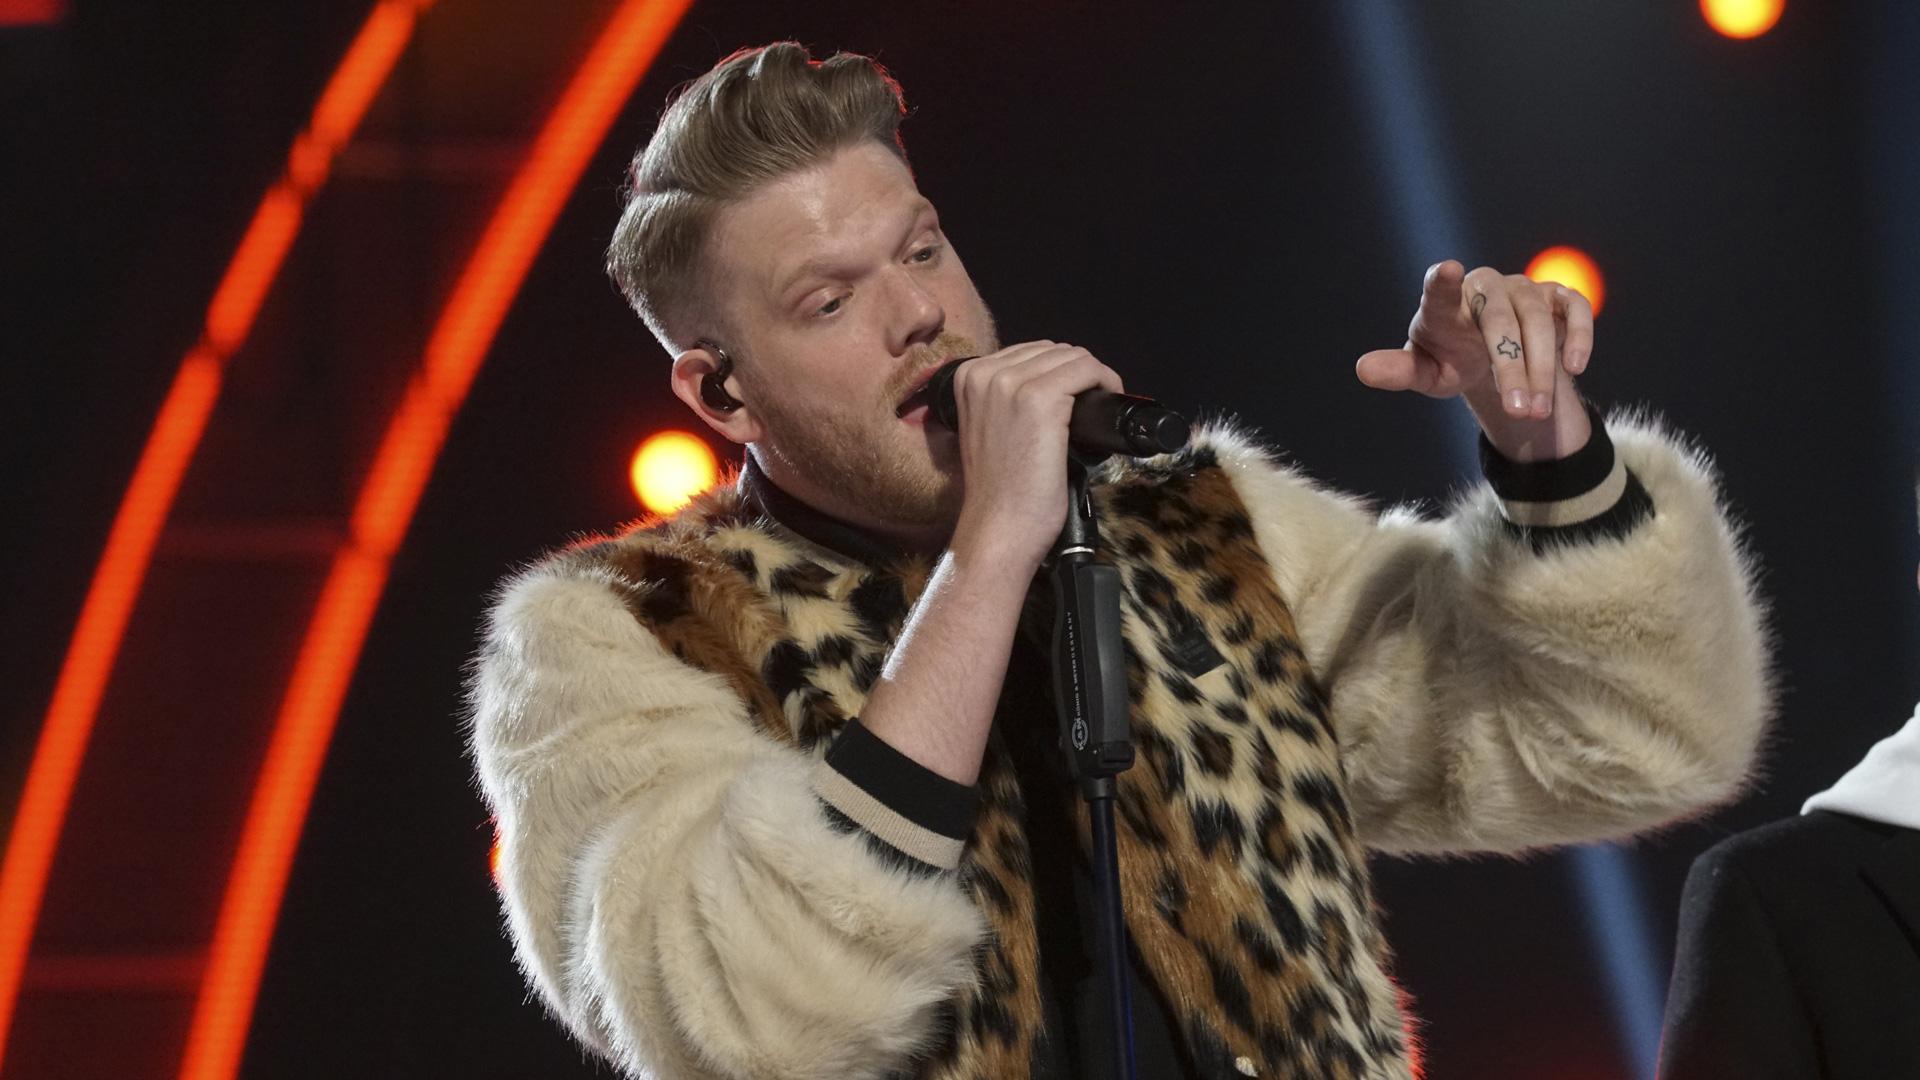 Pentatonix singer Scott Hoying looks like he's really feeling his performance.